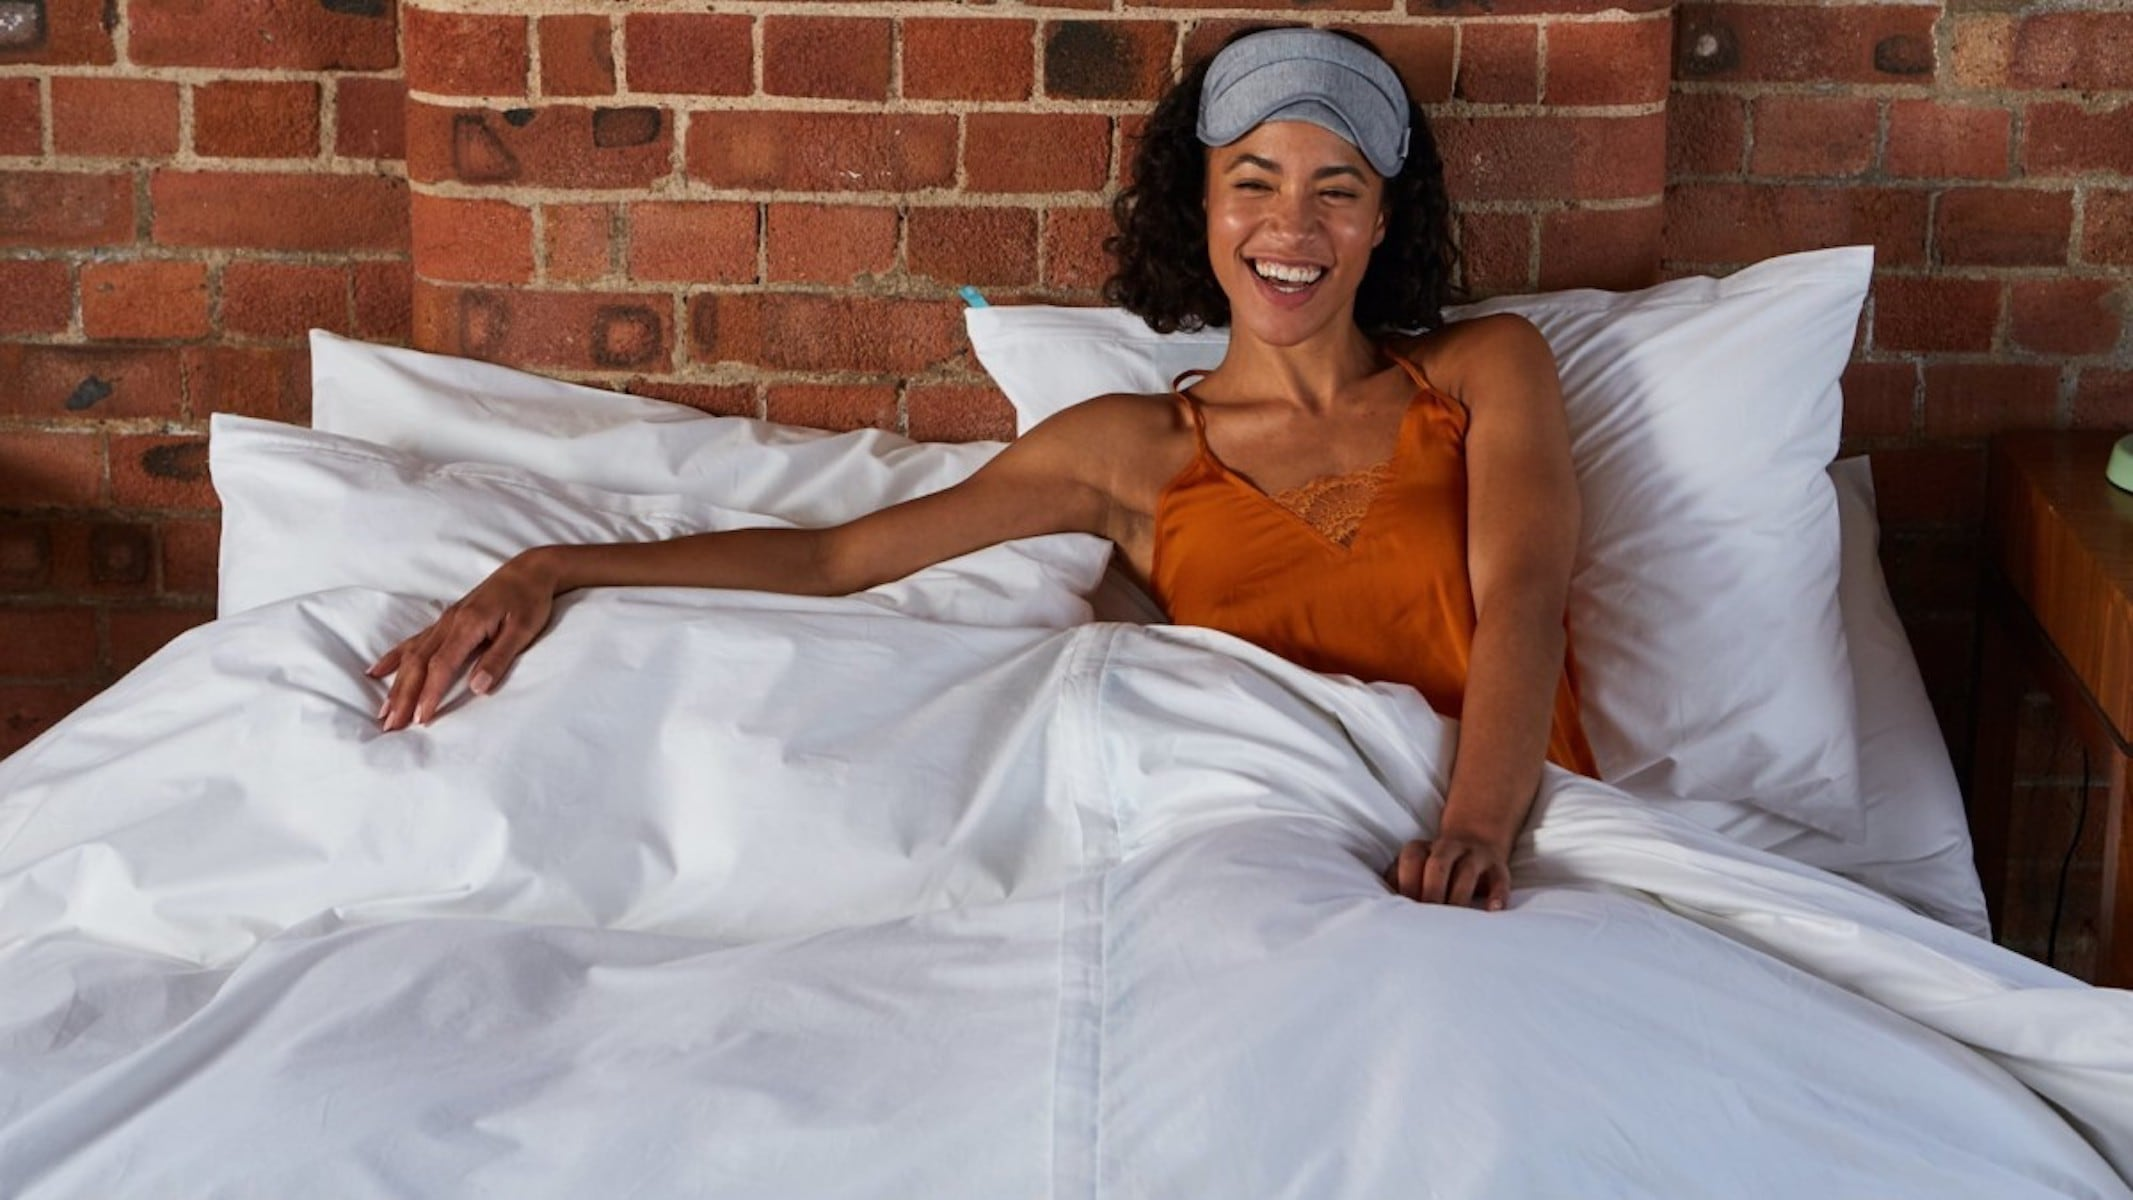 The ultimate bedroom gadget guide